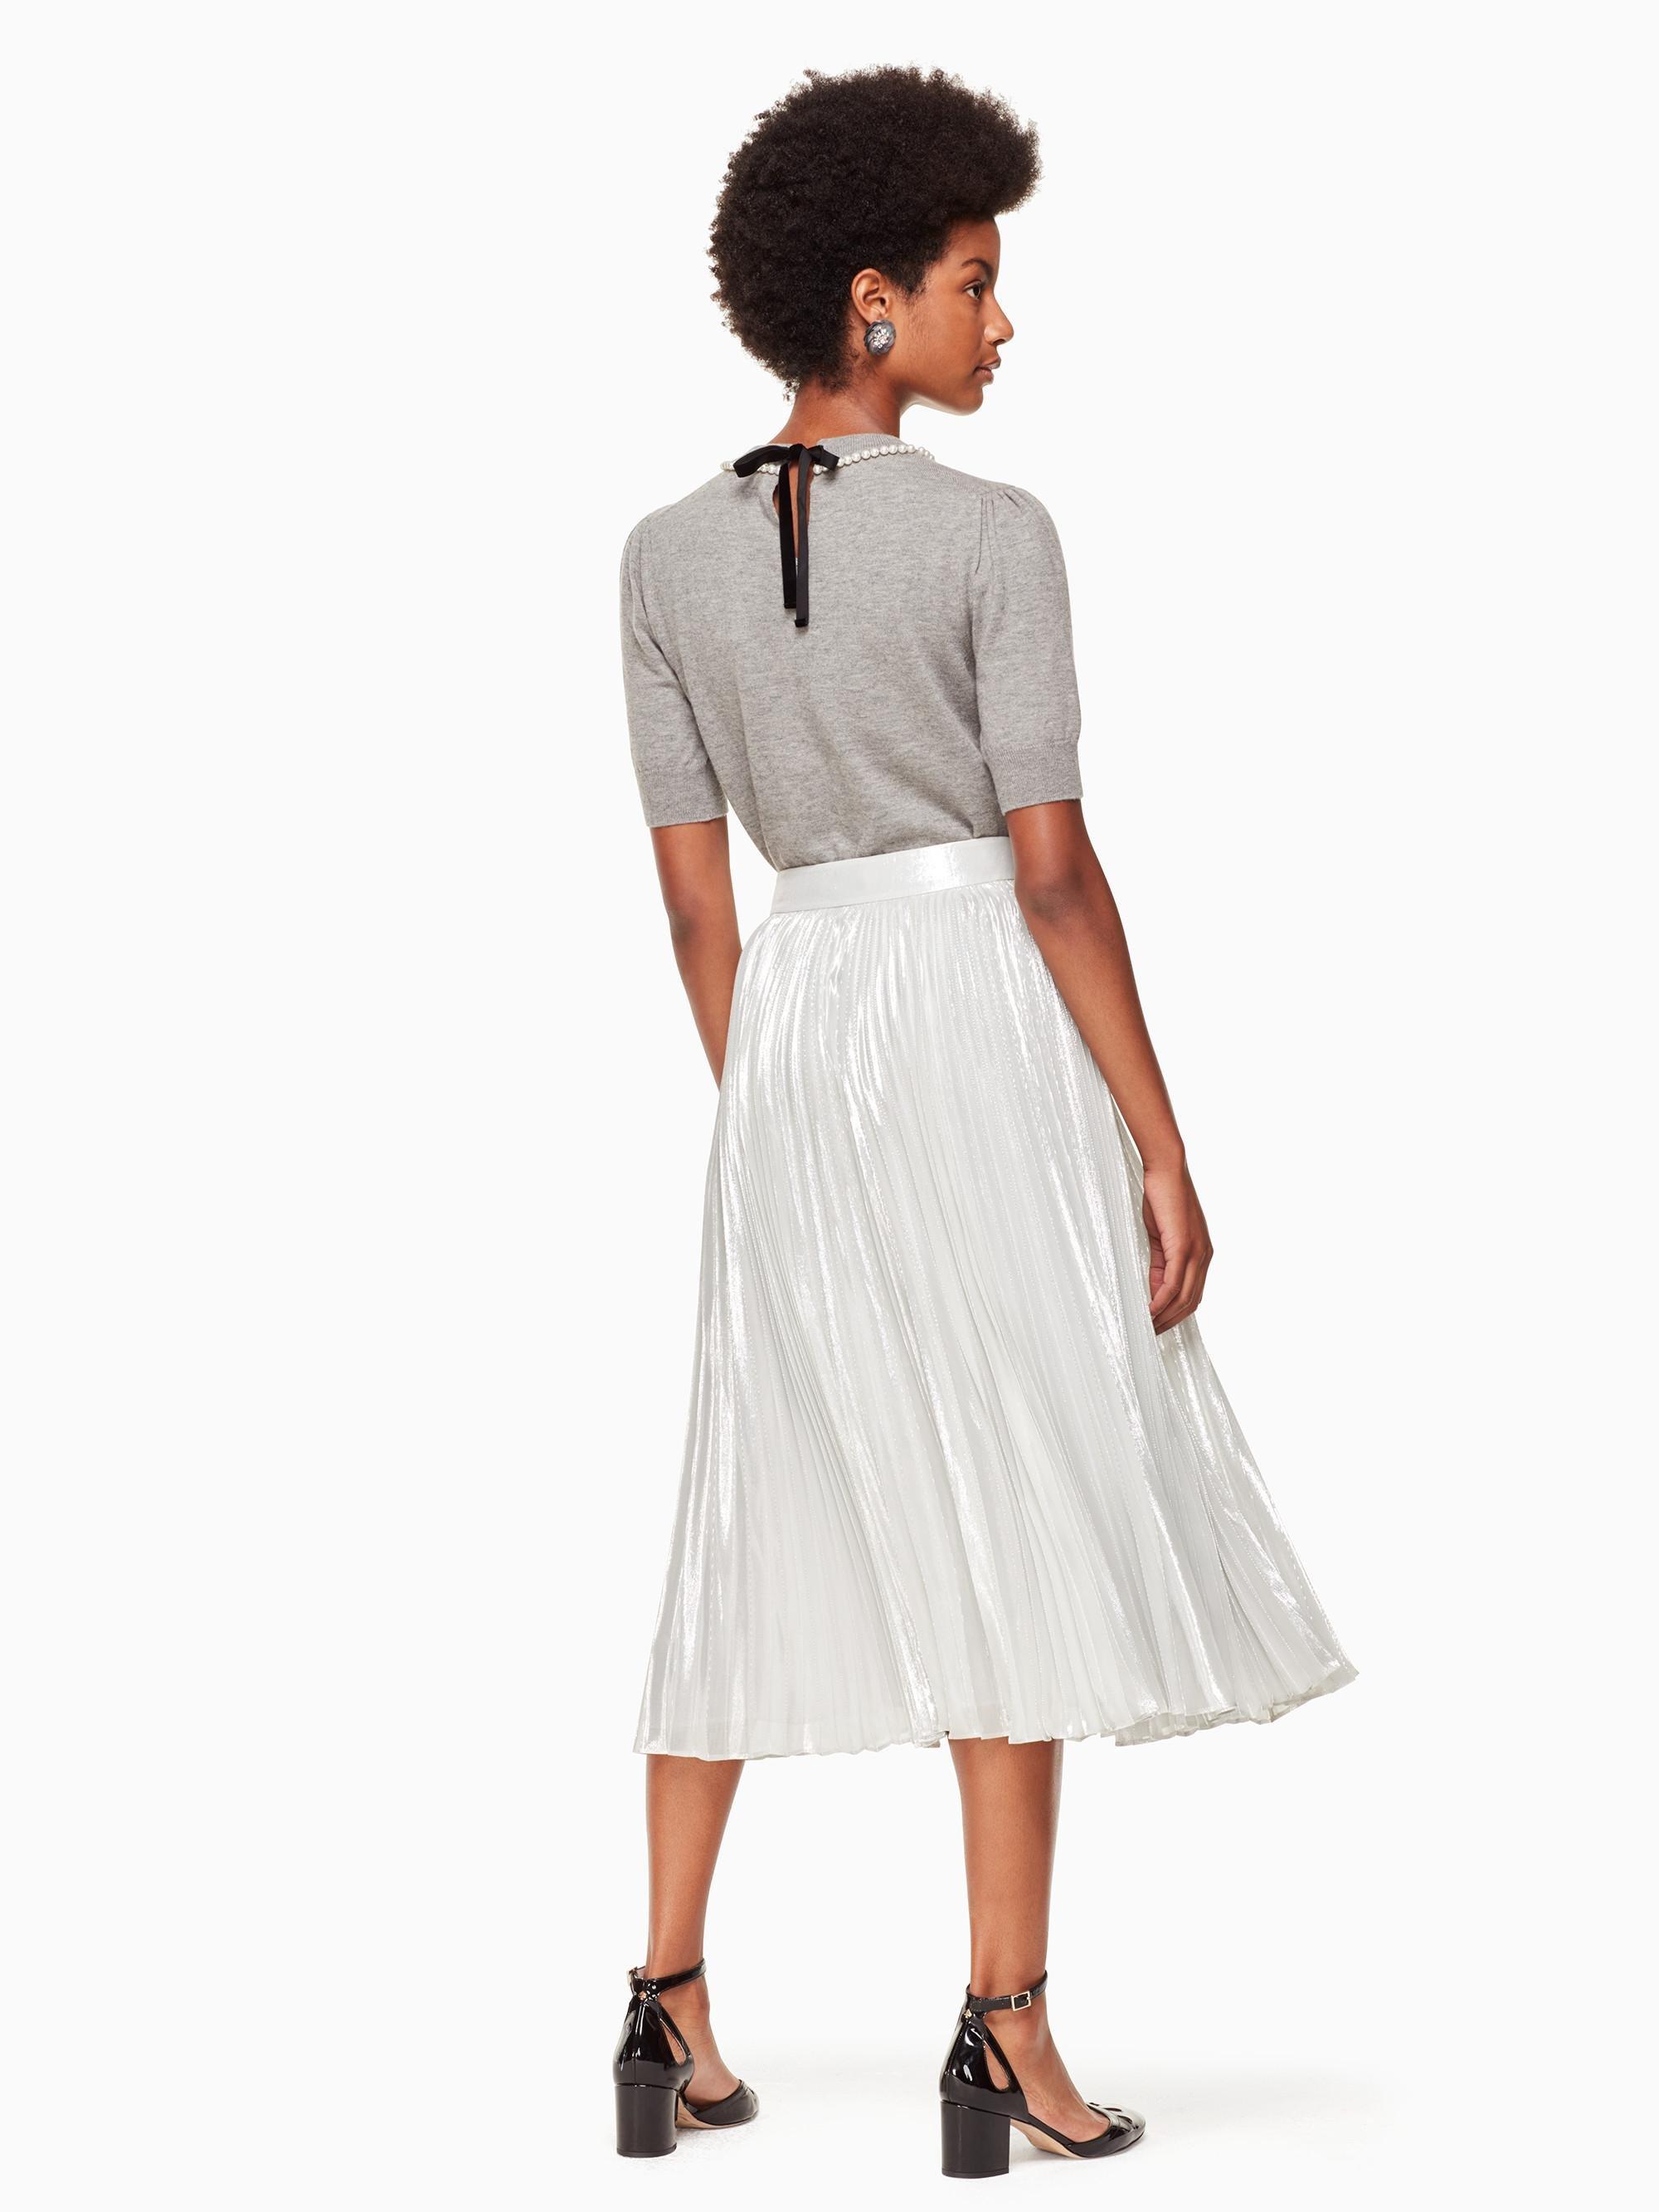 6152cbcb7c76 Kate Spade Silver Metallic Pleated Skirt in Metallic - Lyst